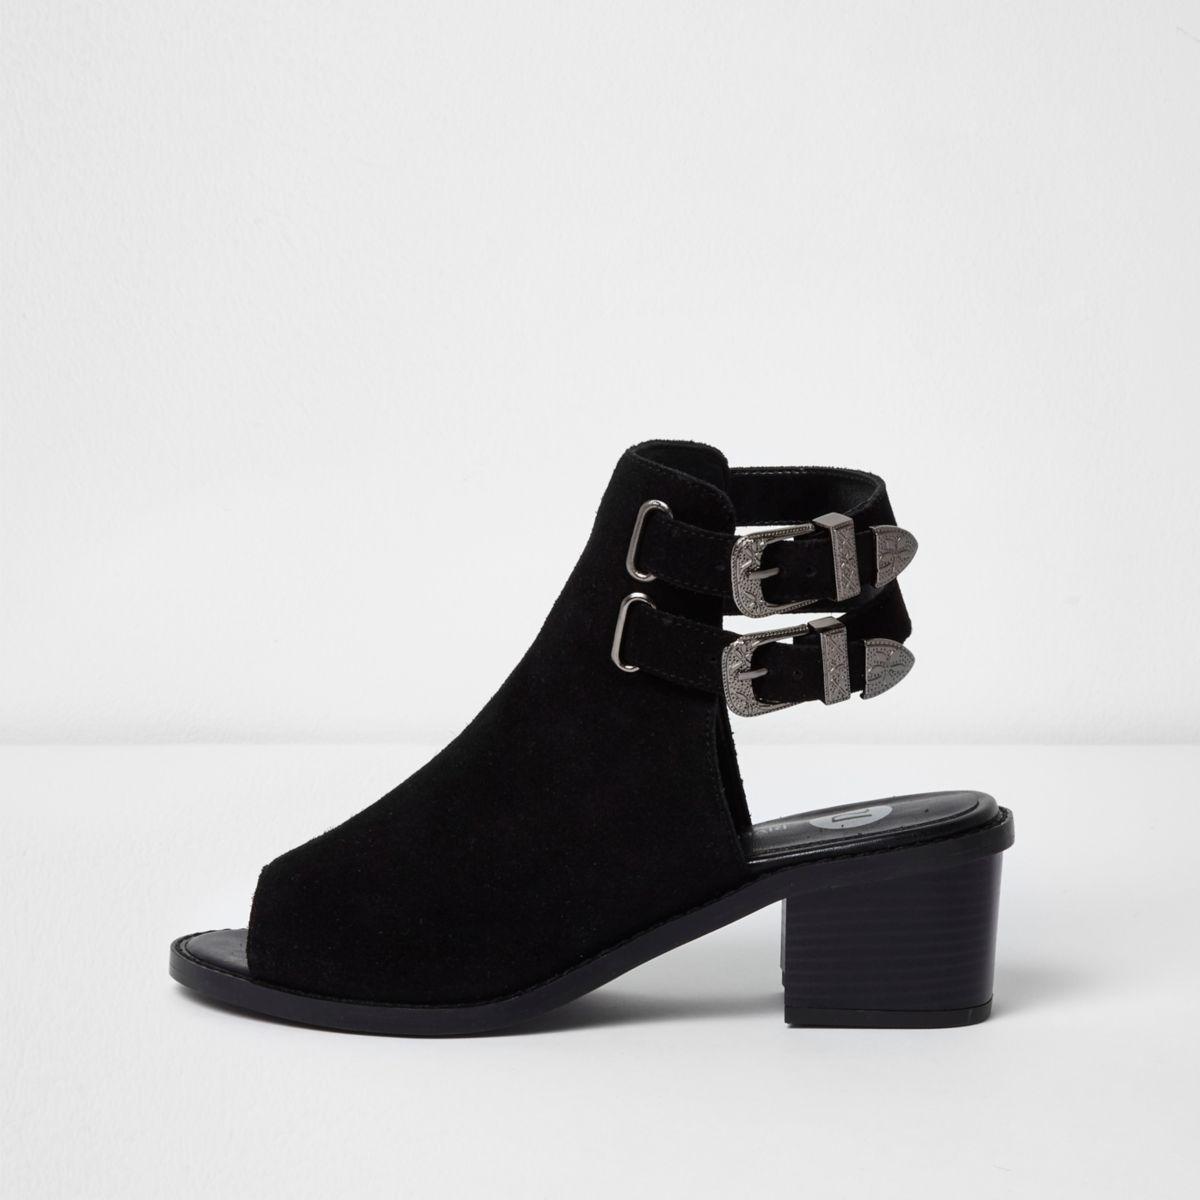 Black suede western style peep toe shoe boot